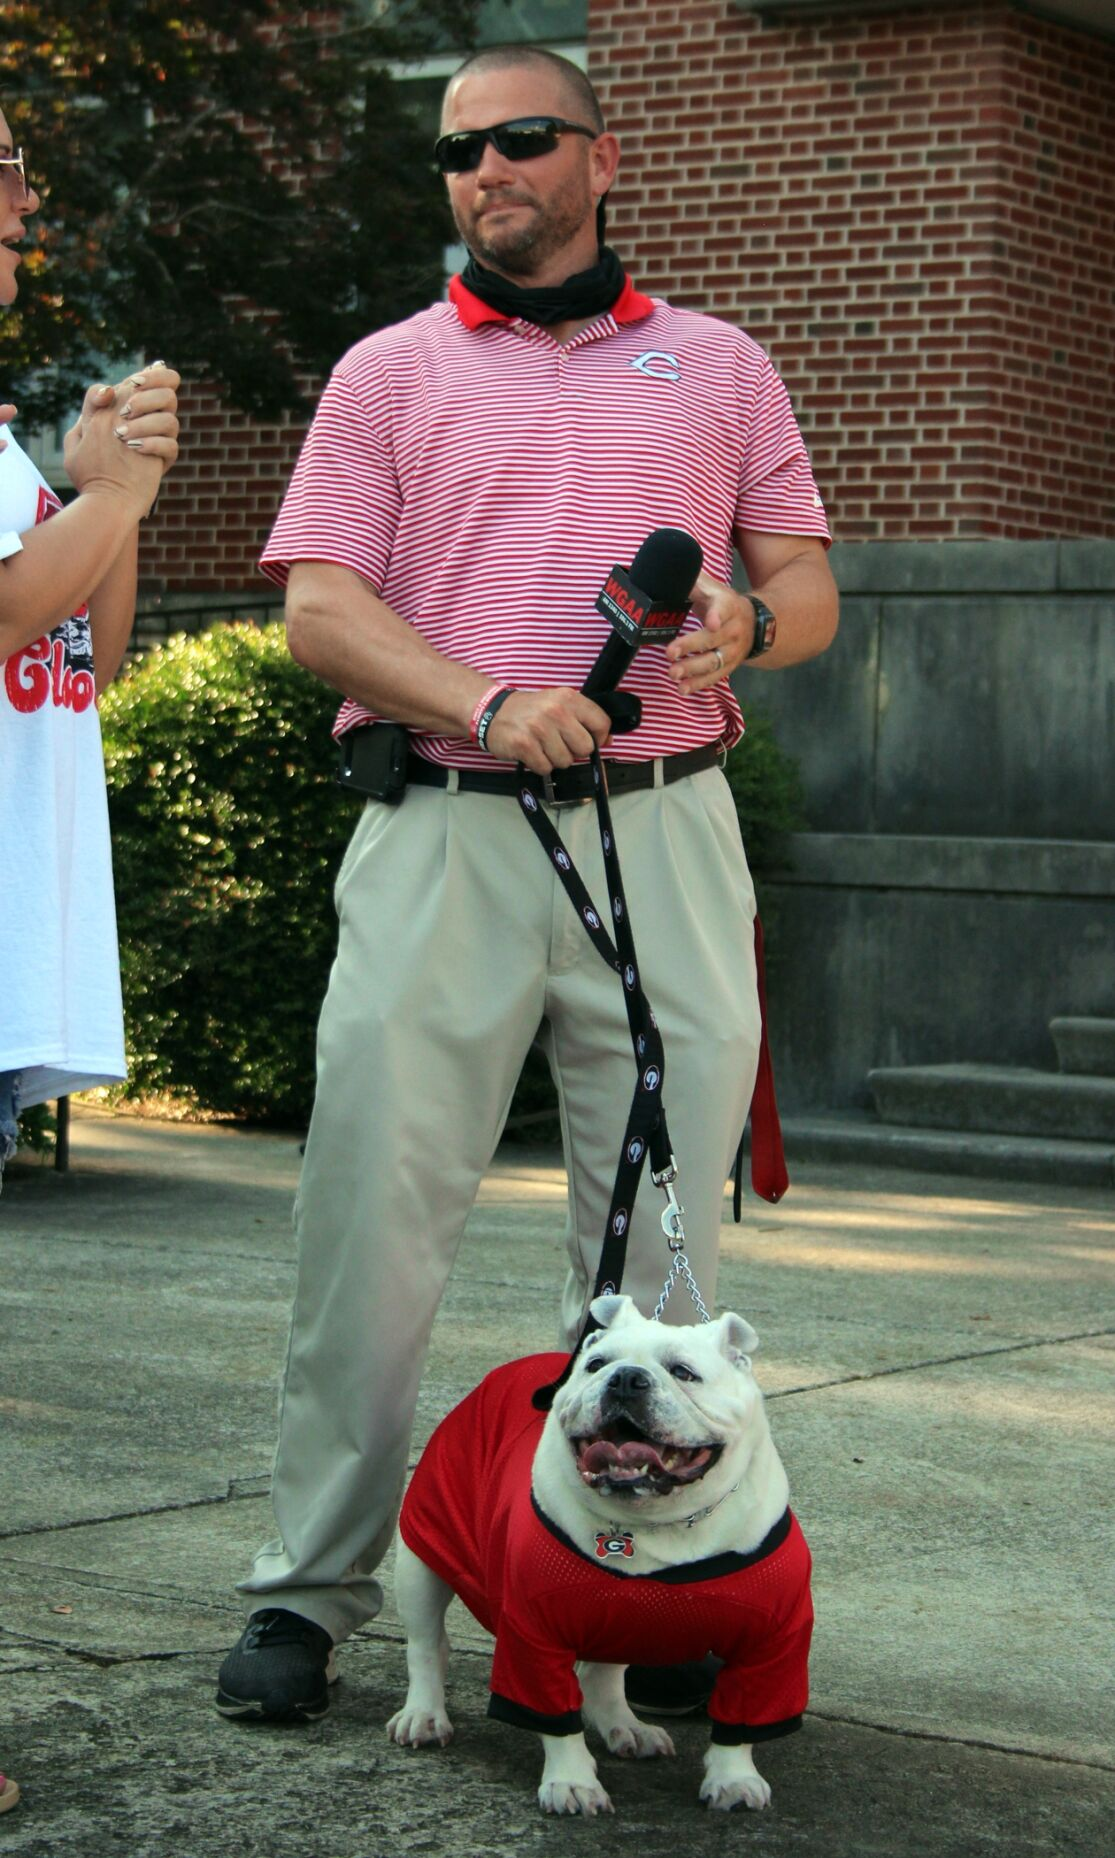 Bulldog Bash held to celebrate the new football season